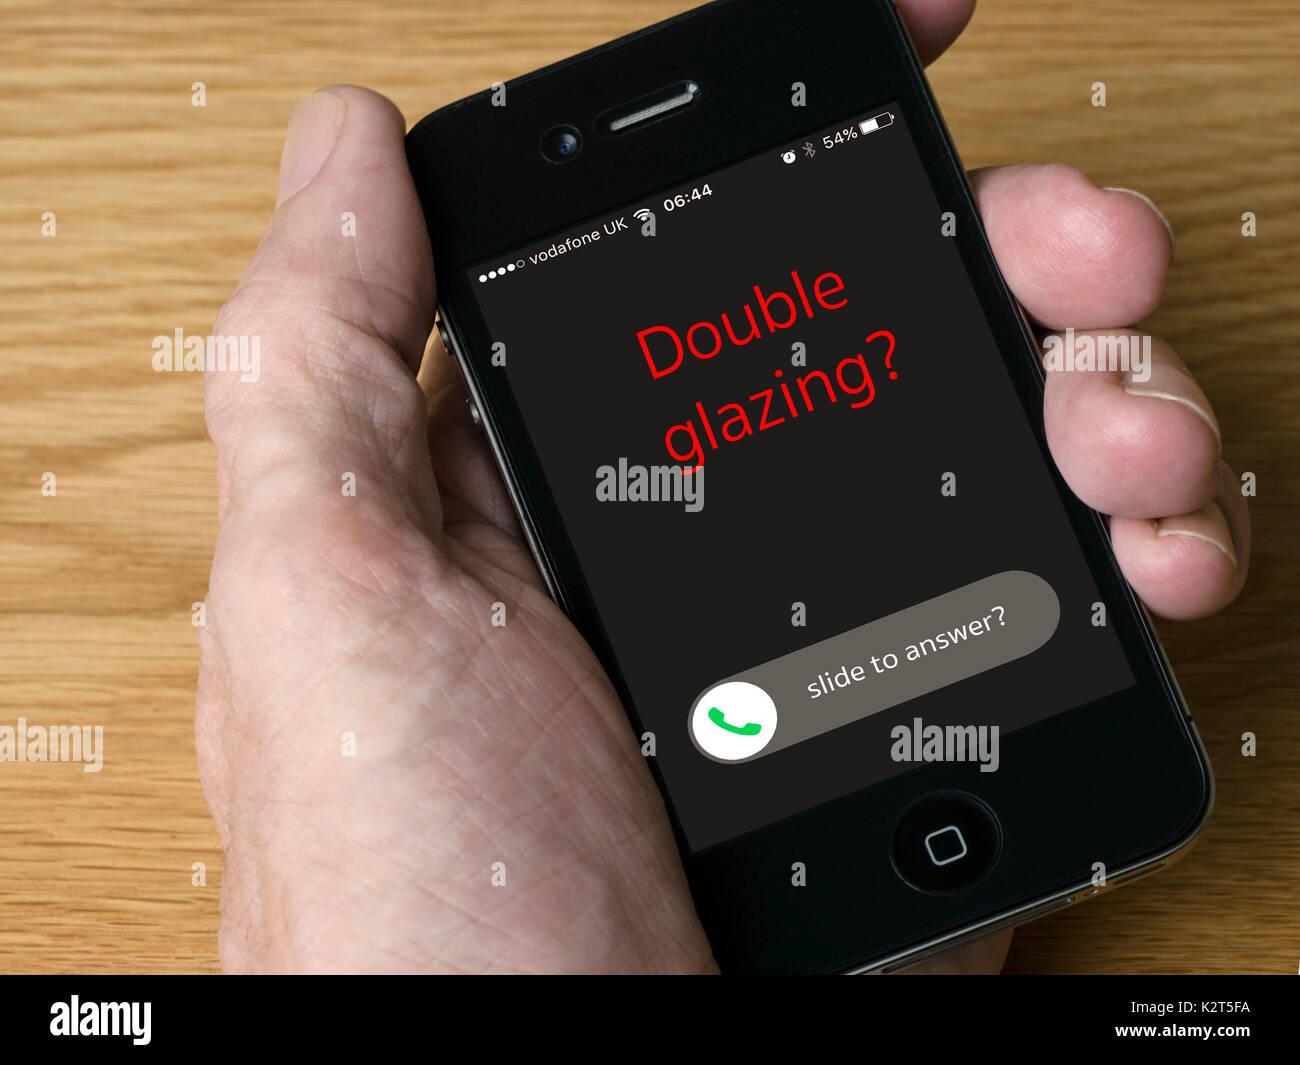 Concept image - Incoming double glazing salesman nuisance call on iPhone mobile phone display - Stock Image